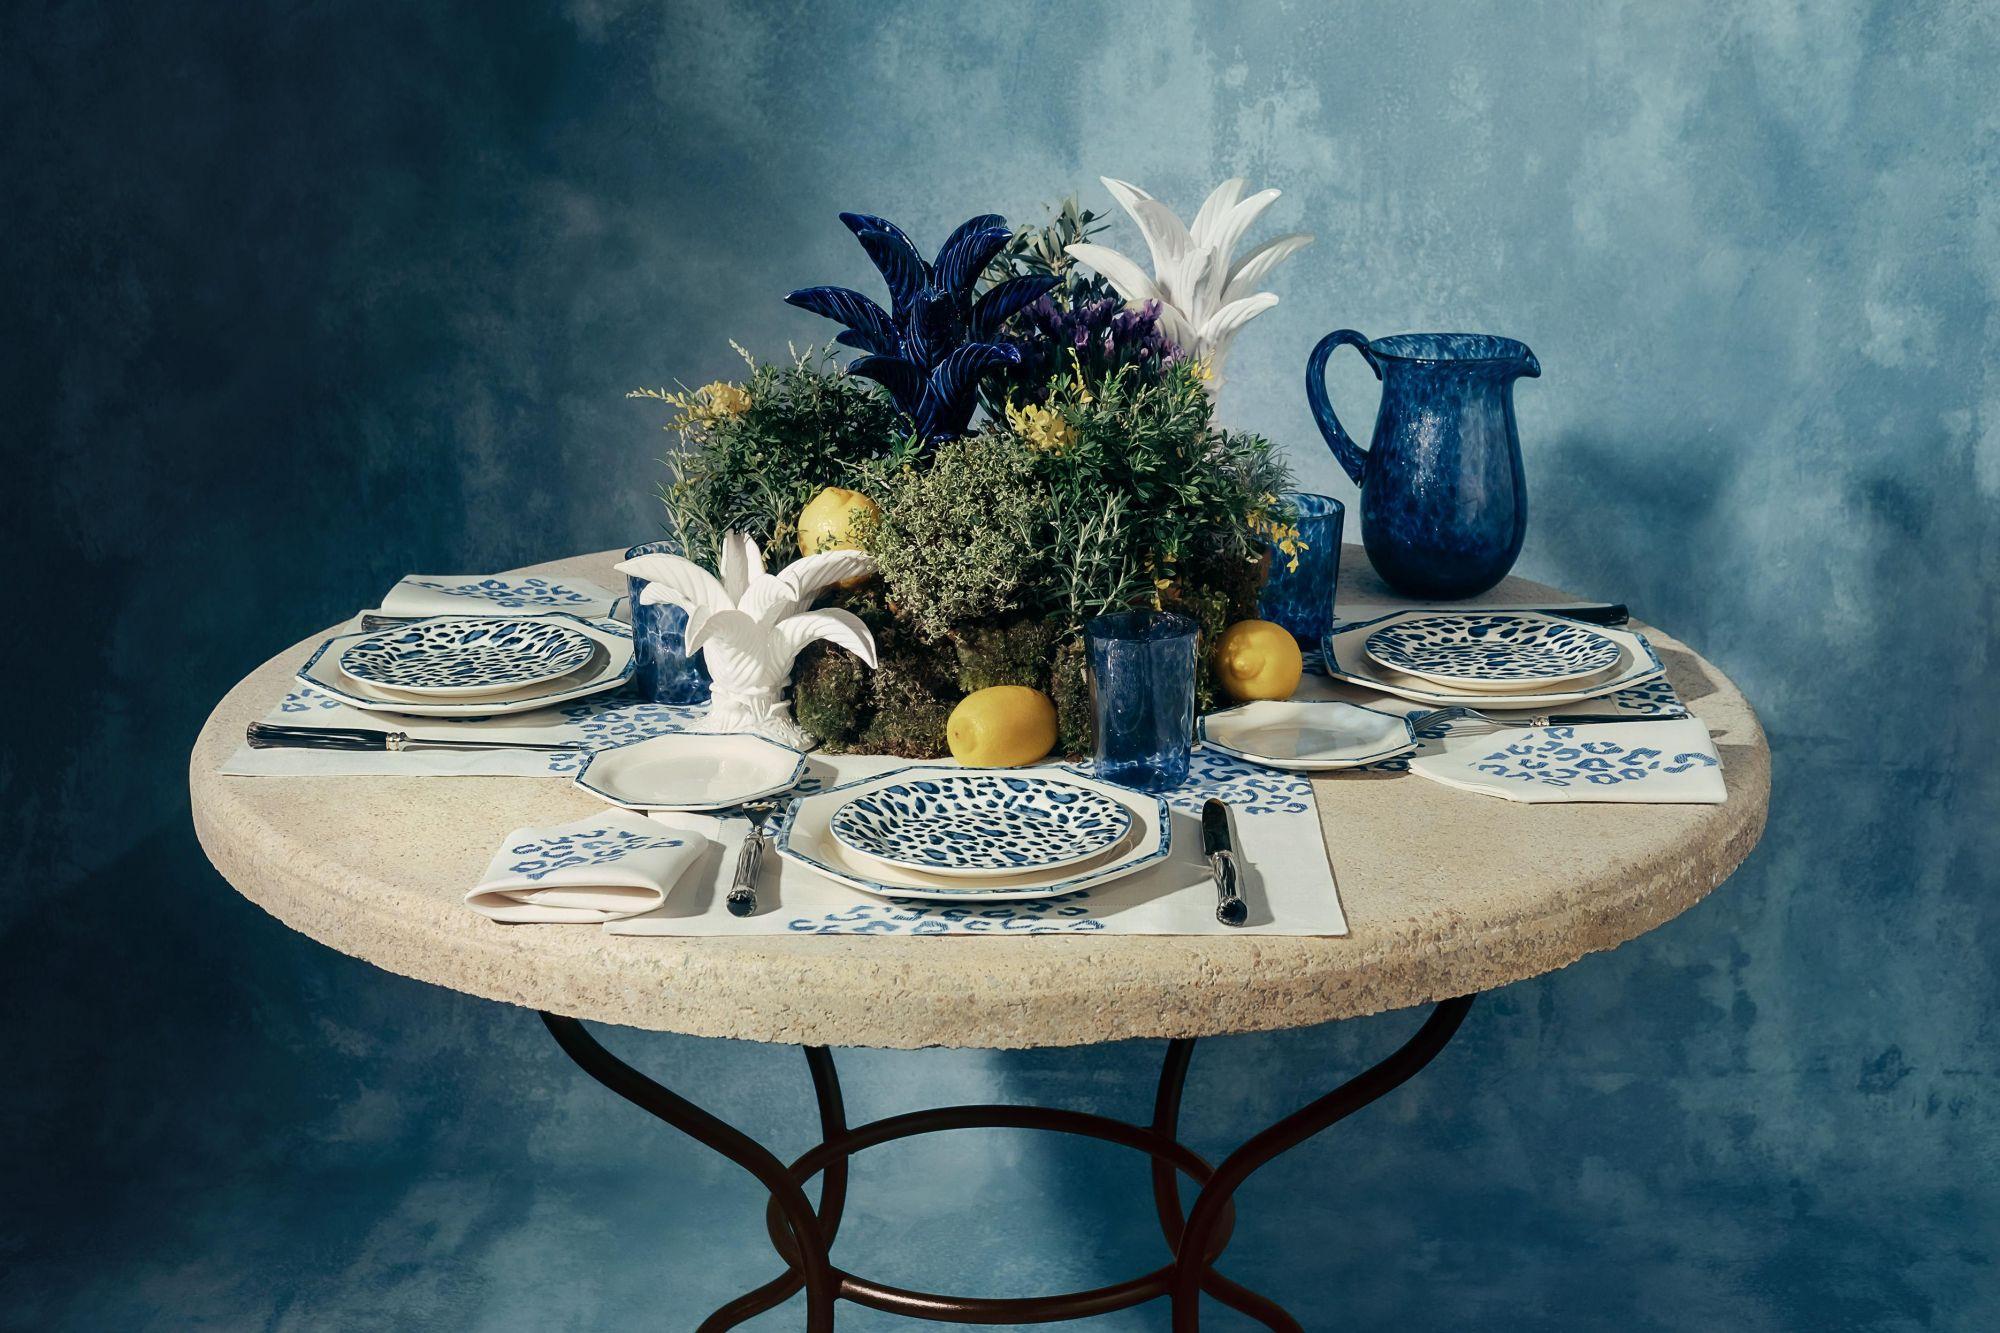 Dior 私藏 5 個「仙氣翩翩」家飾系列,迪奧先生小花園、神秘塔羅牌⋯⋯你認得幾個秀上招牌圖樣?